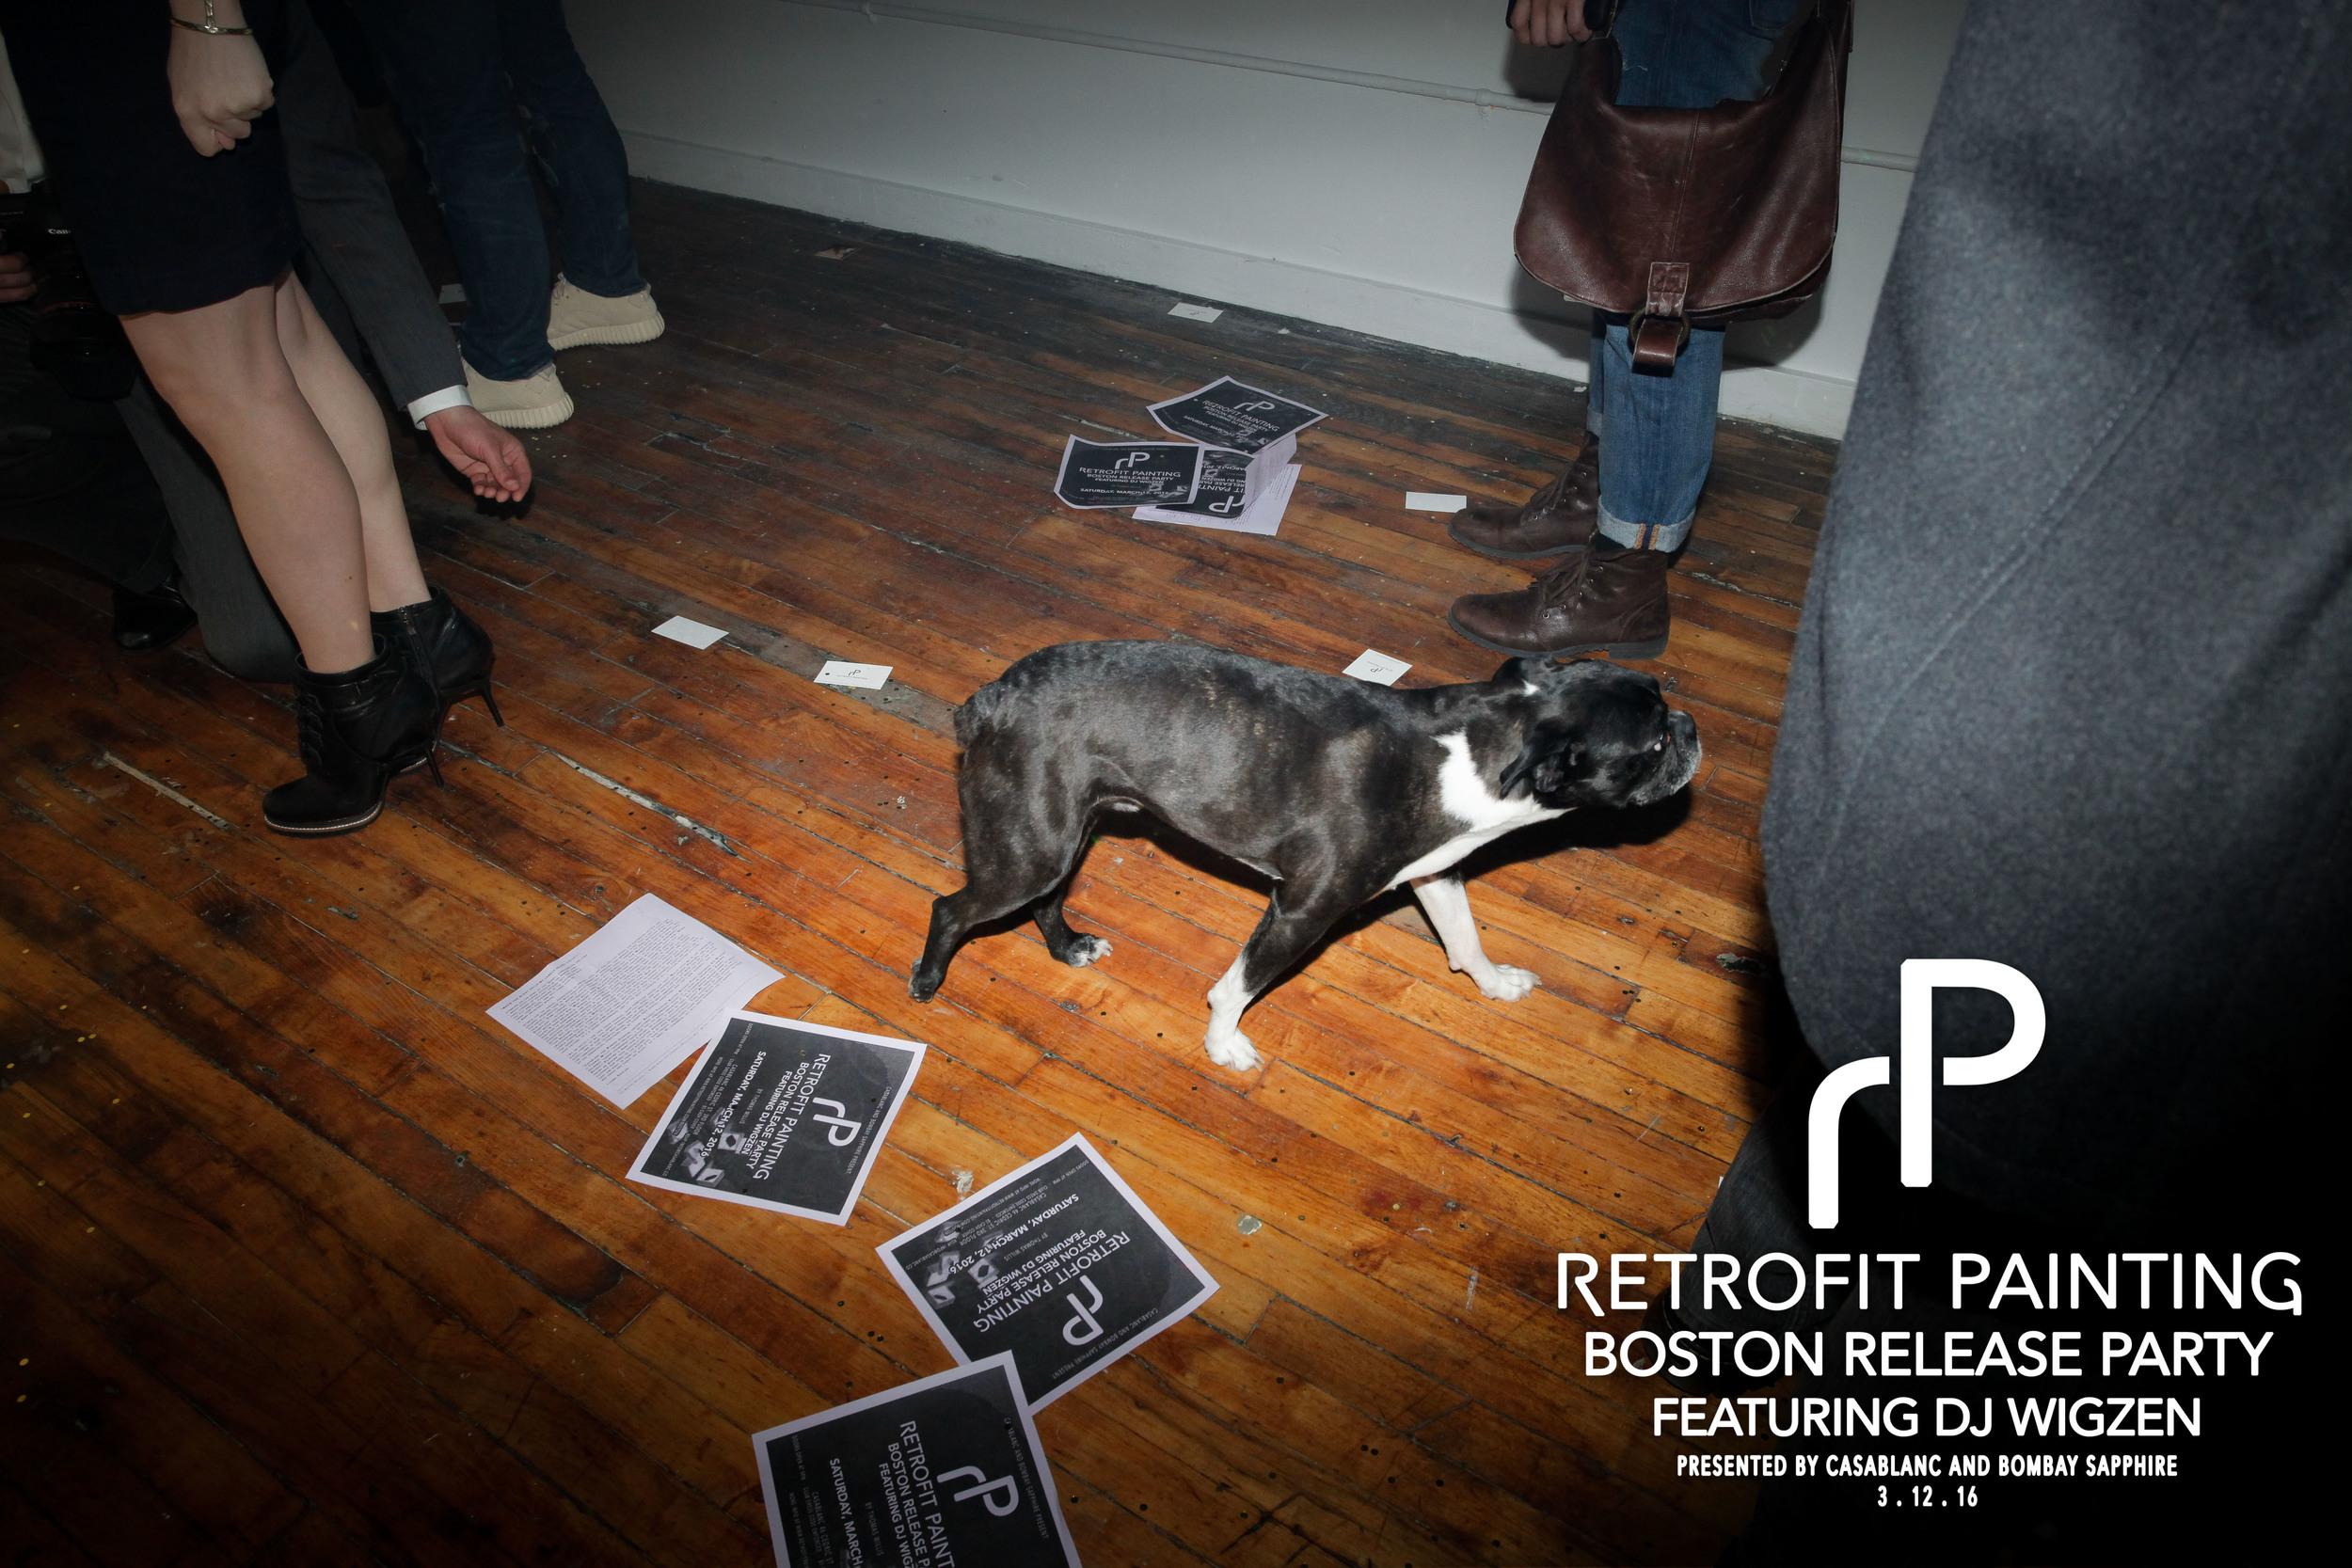 Retrofit Painting Boston Release Party 0057.jpg